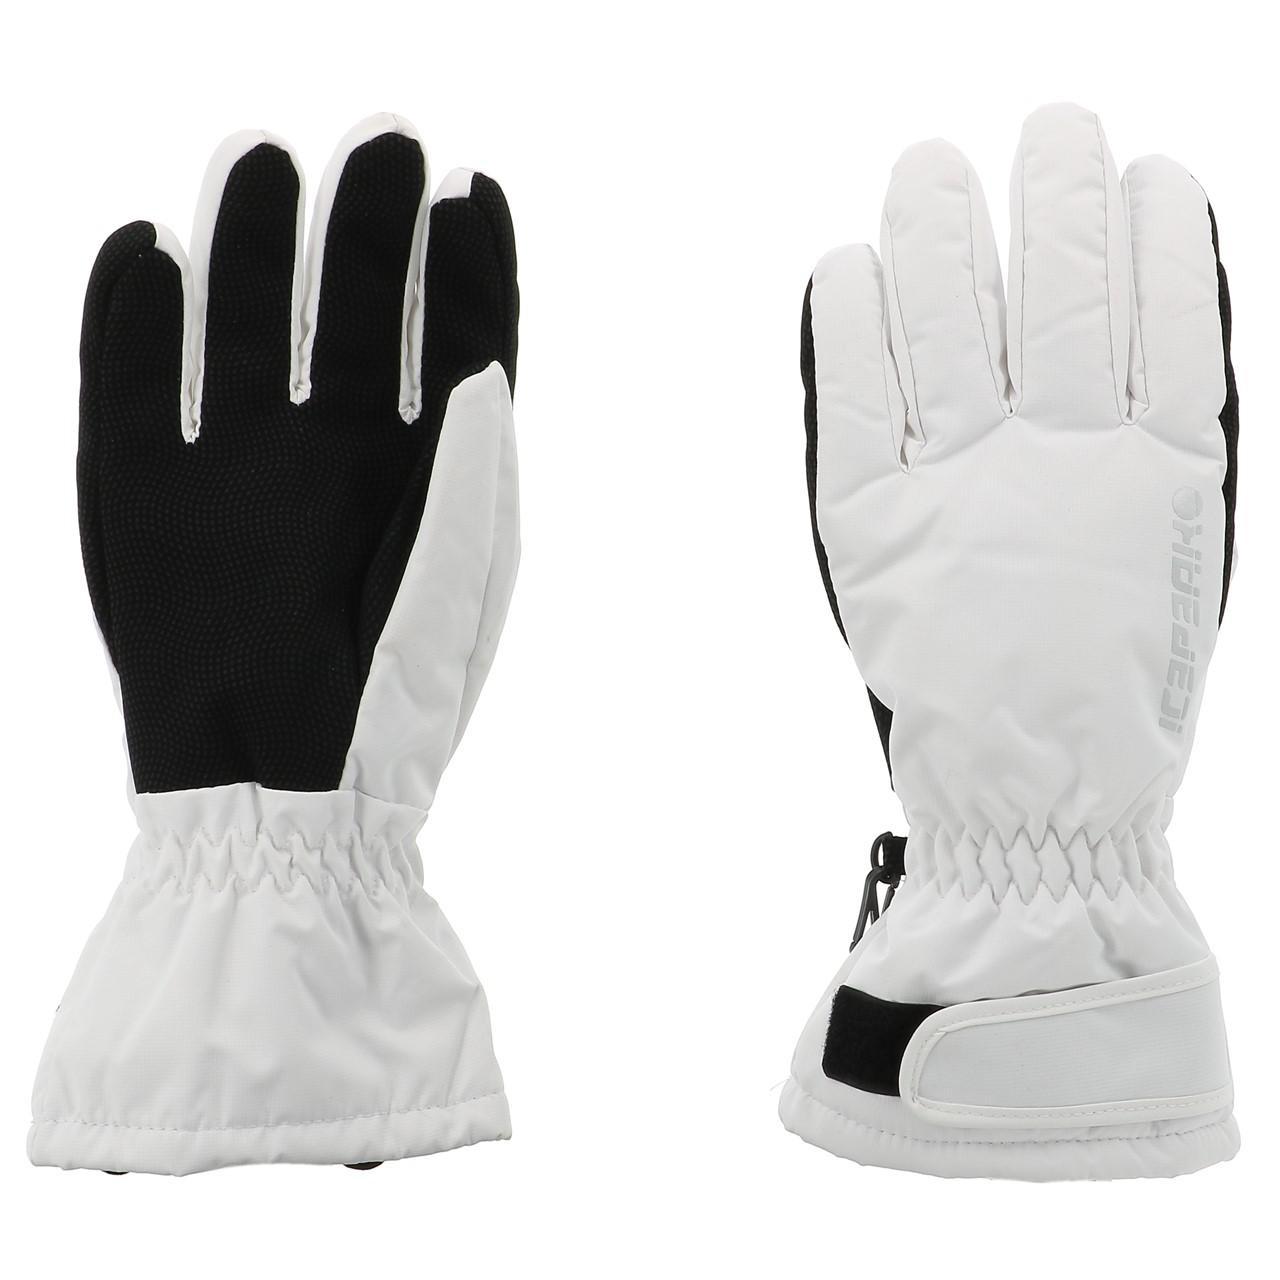 Gants-de-ski-Icepeak-Diisa-blanc-gants-ski-l-Blanc-14370-Neuf miniature 2